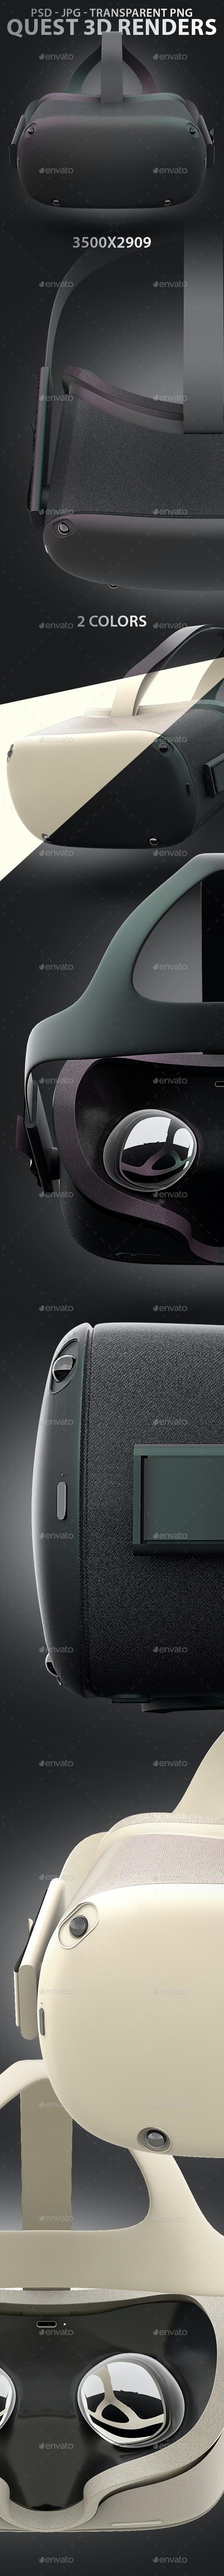 Quest Headset 3D Renders in 2 Colors - Technology 3D Renders